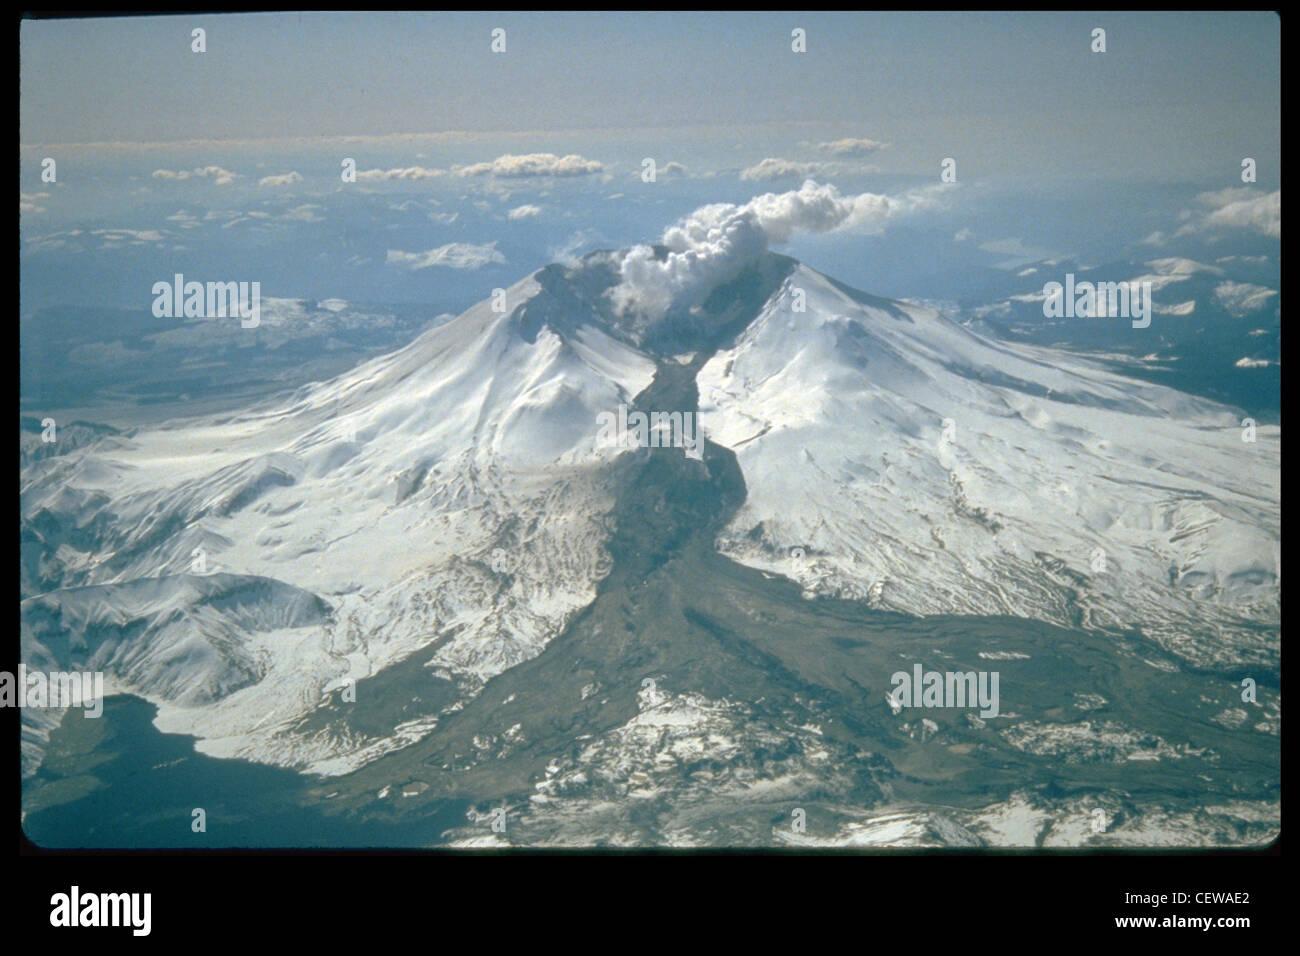 Mount St. Helens erupted often between 1980 and 1986. An ...